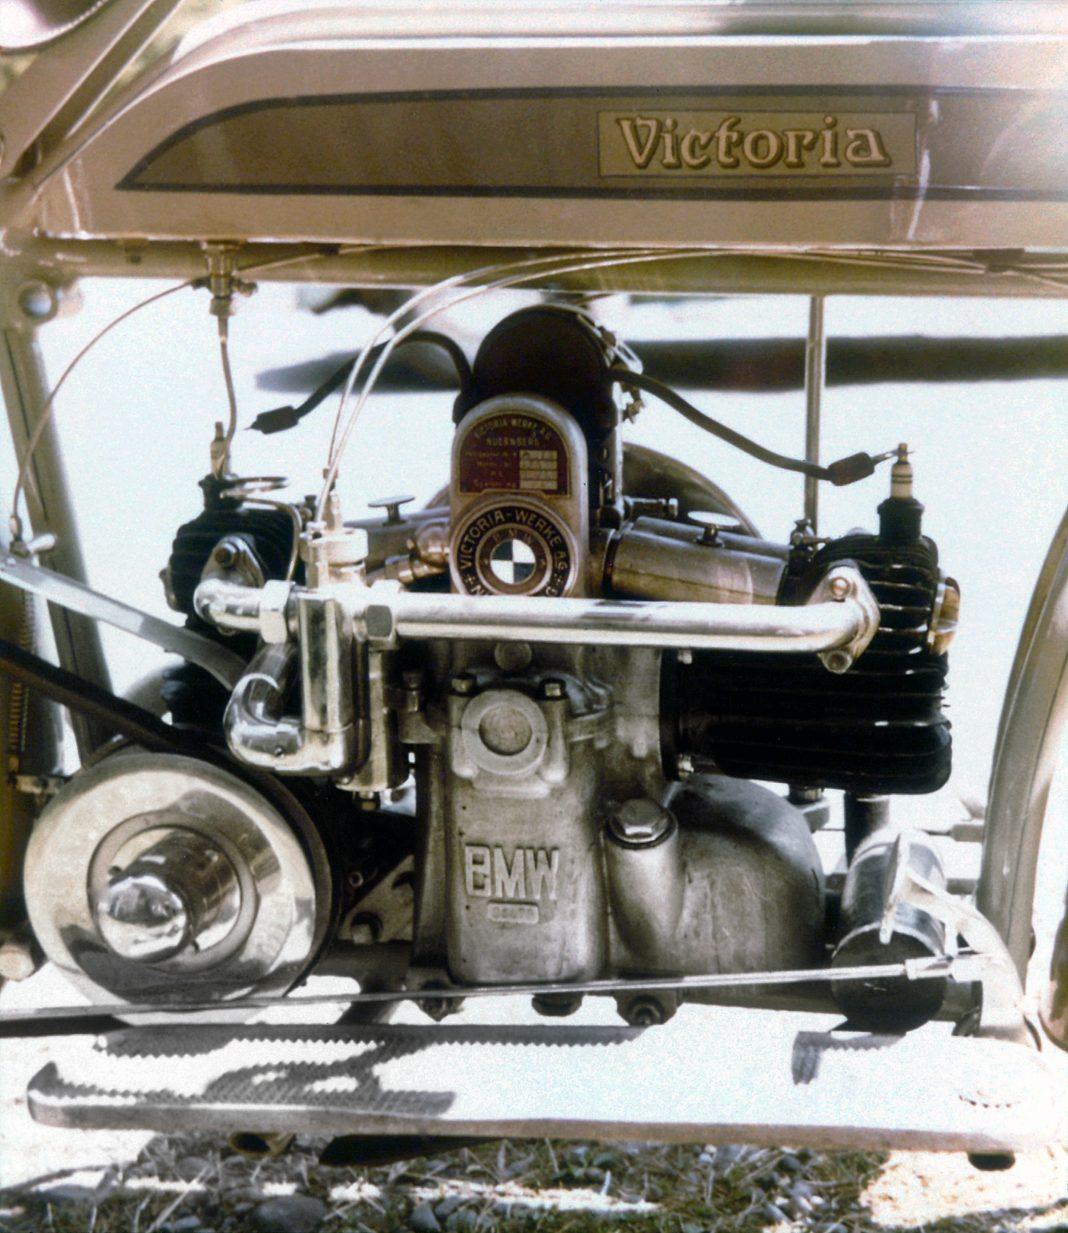 istorie-12-1068x1233 Istorie: 100 de ani de motoare boxer BMW